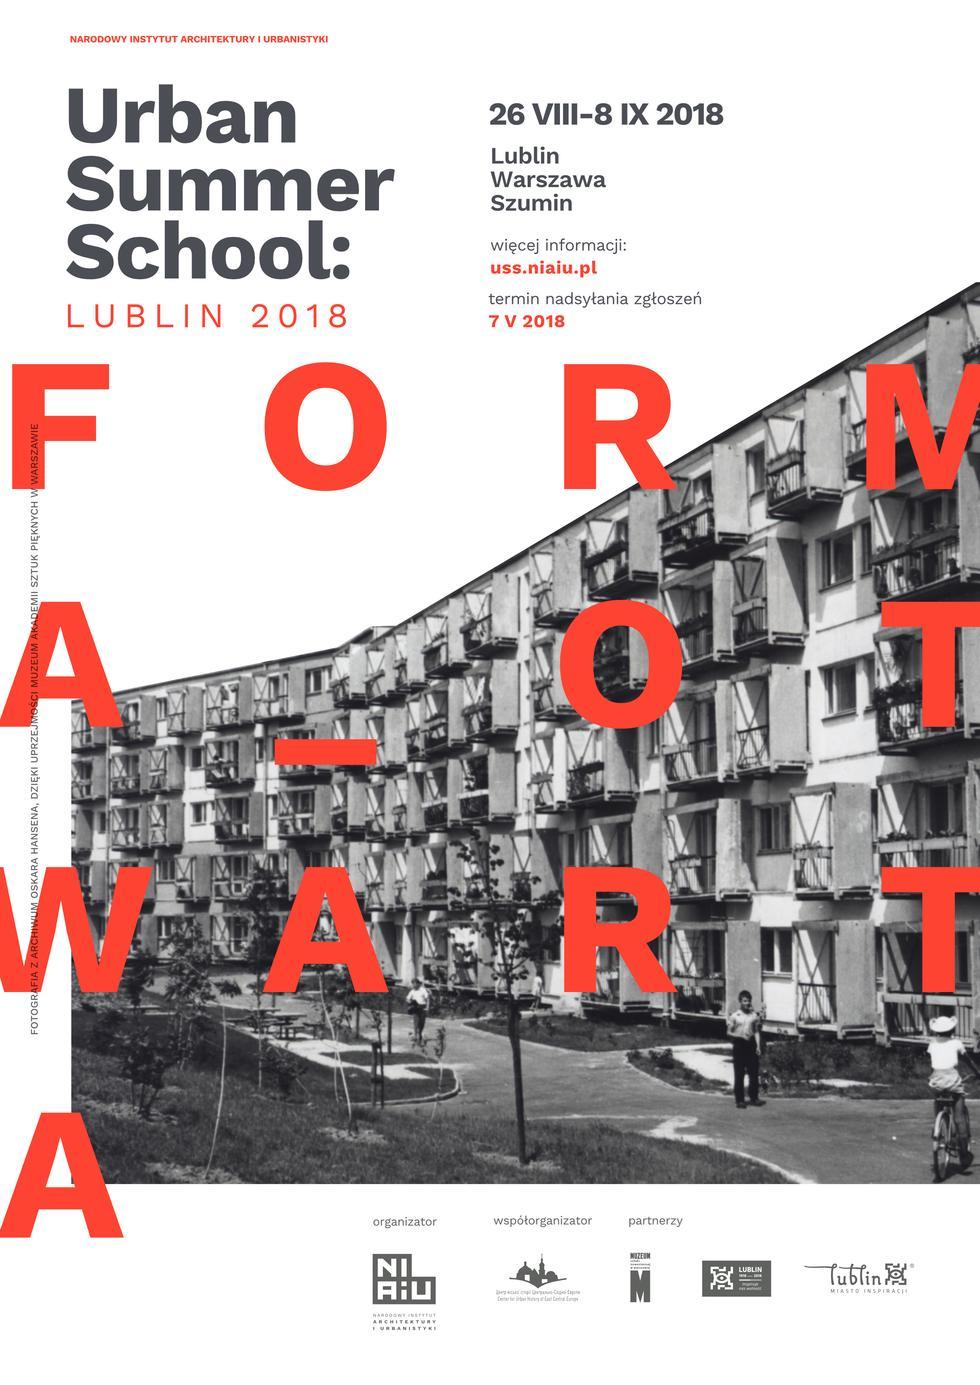 Urban Summer School - Lublin, Warszawa, Szumin